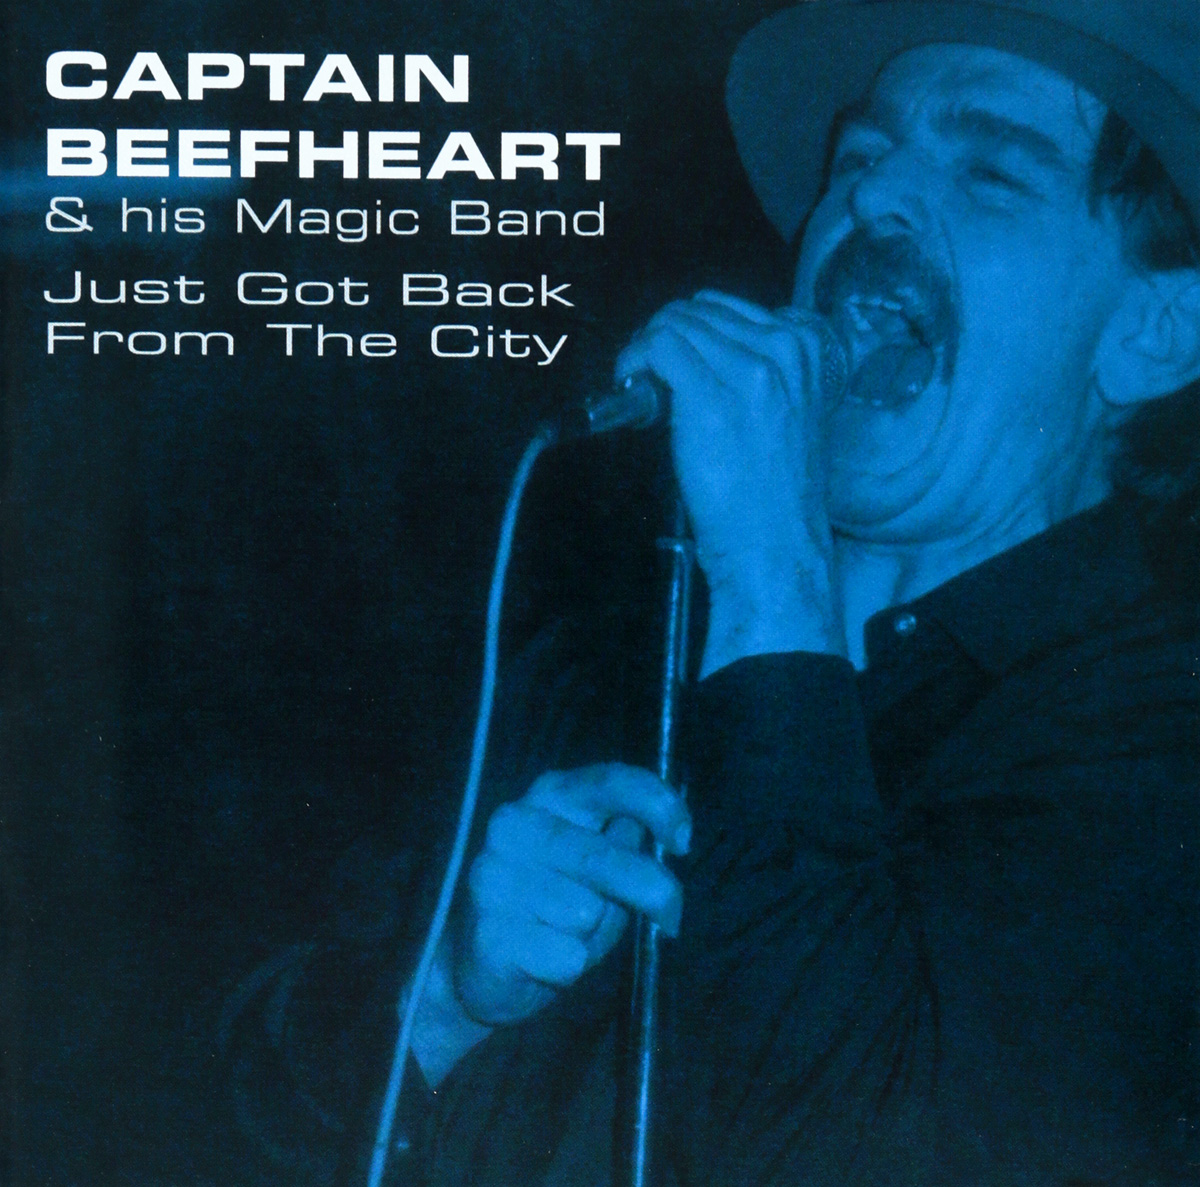 лучшая цена Кэптен Бифхарт Captain Beefheart & His Magic Band. Just Got Back From The City